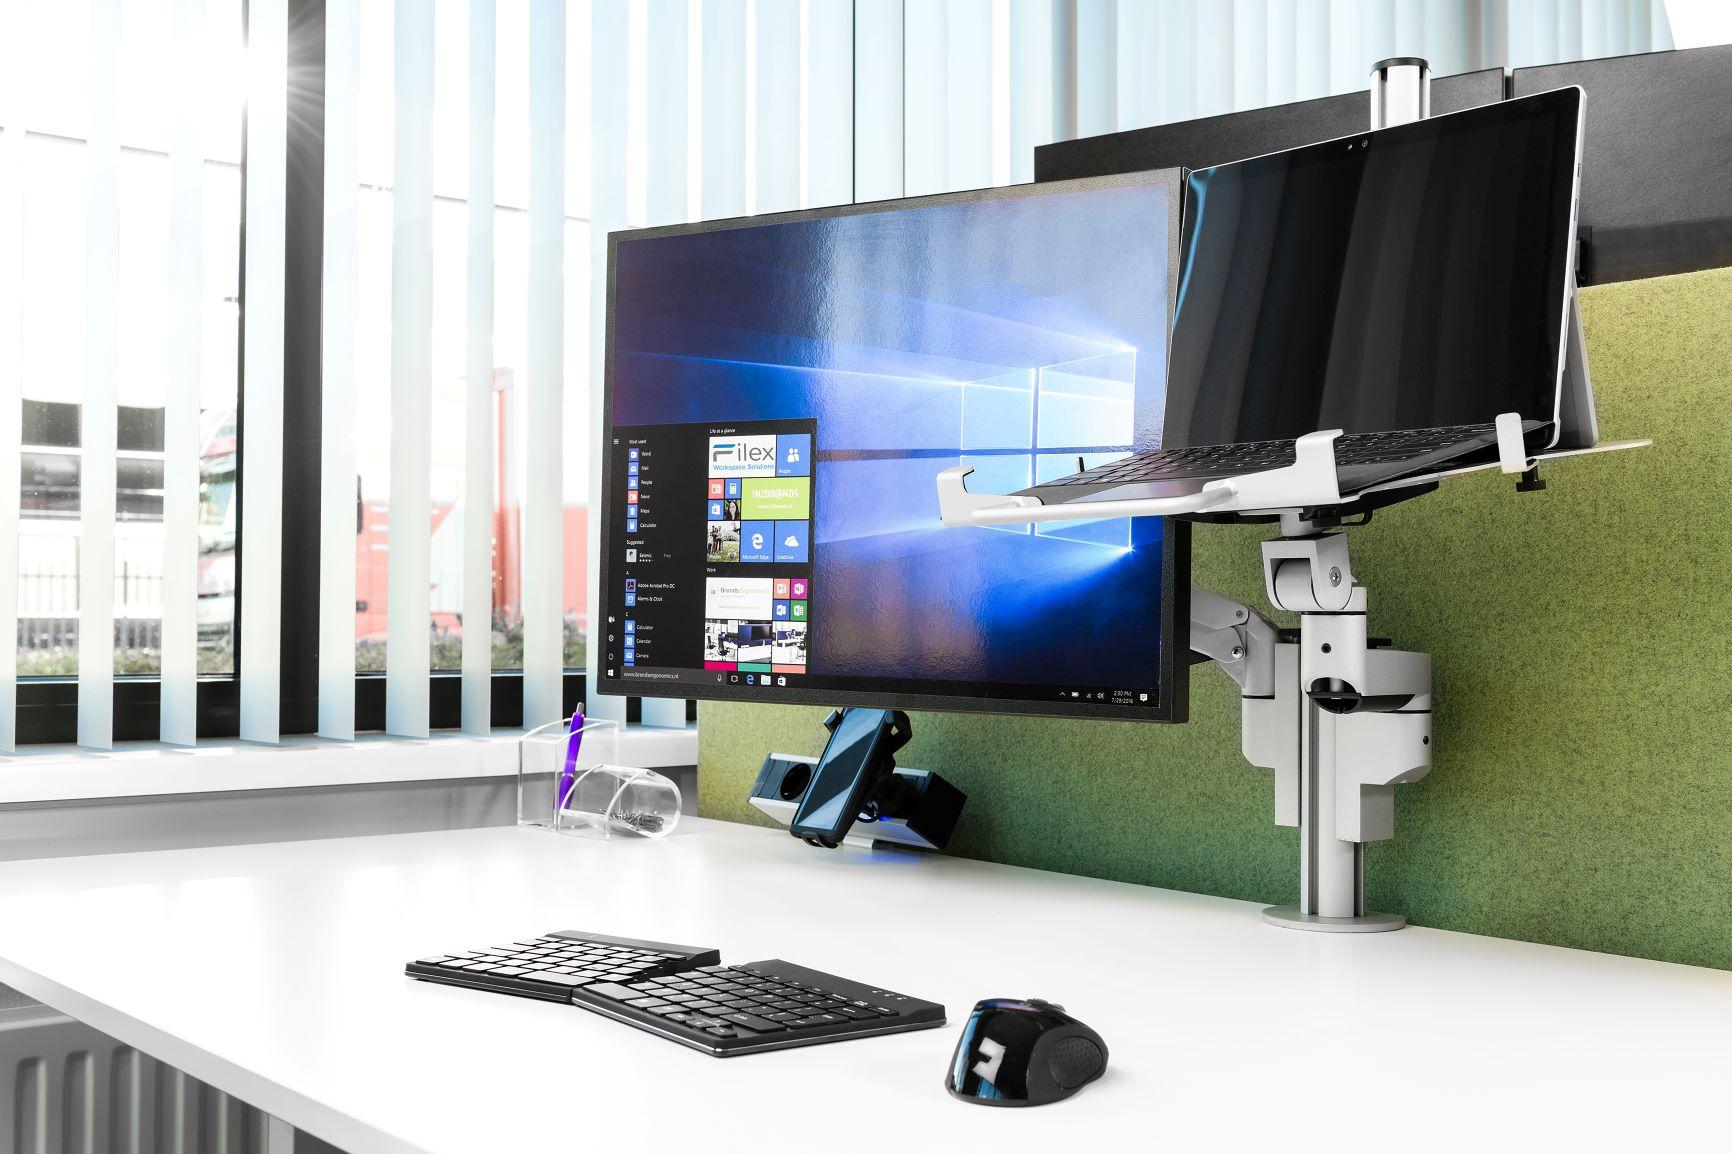 Image: Filex Workspace Solutions